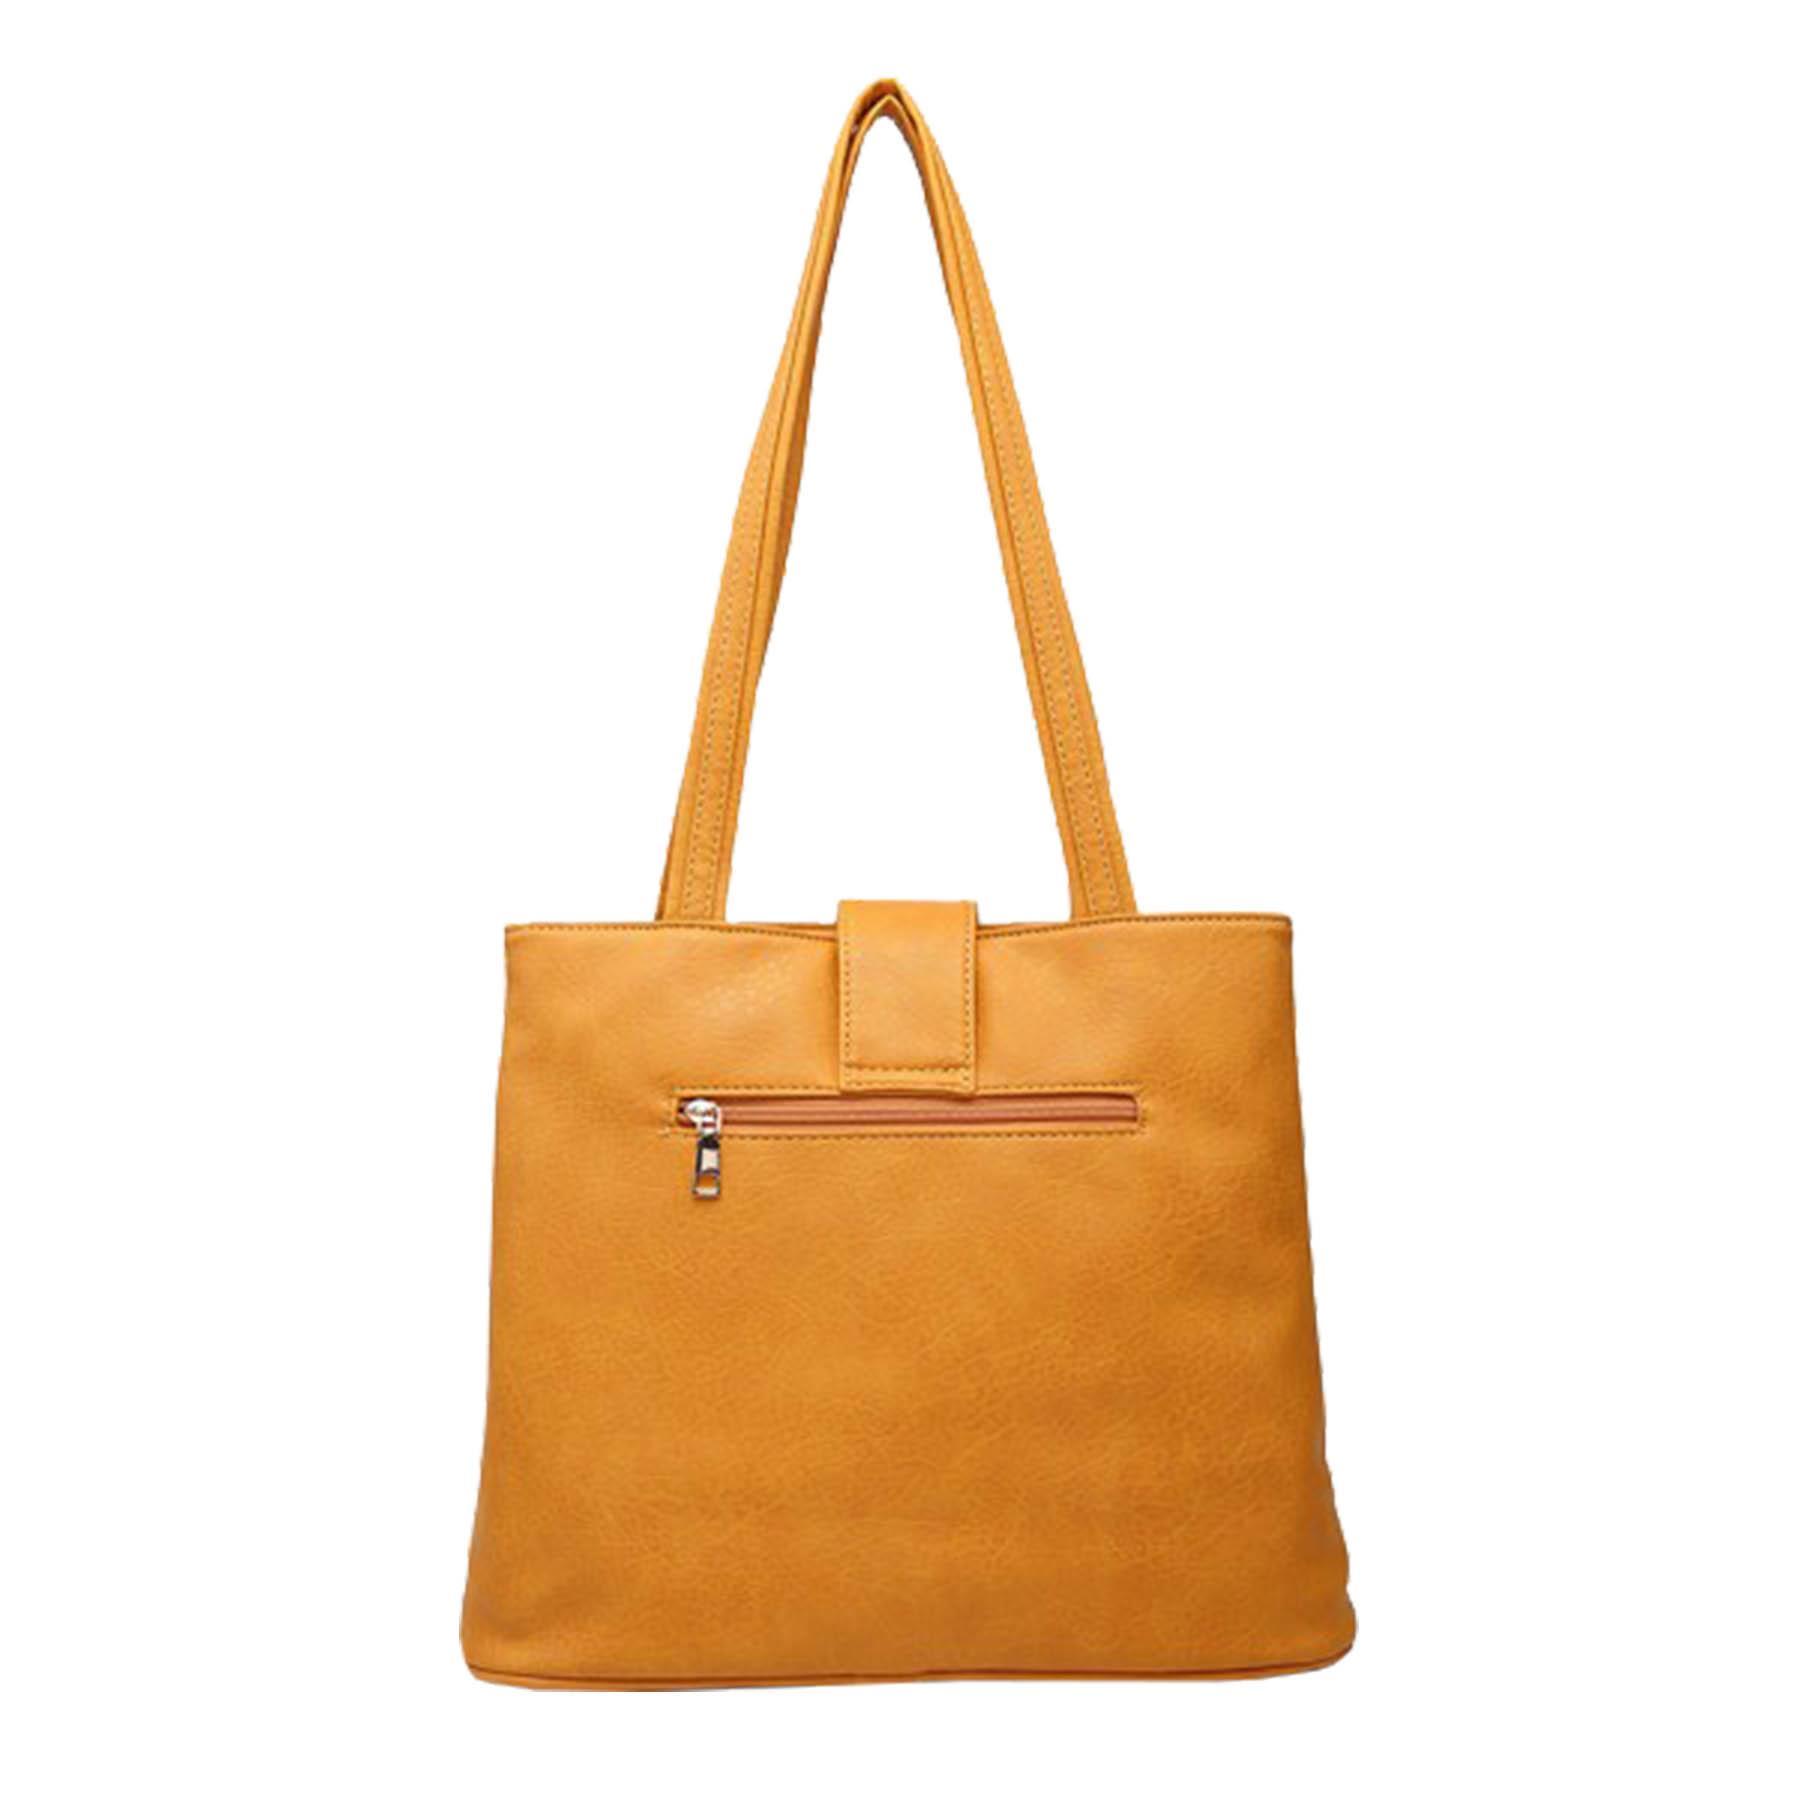 New-Women-s-Metallic-Bow-Decoration-Faux-Leather-Shopper-Shoulder-Tote-Bag thumbnail 9